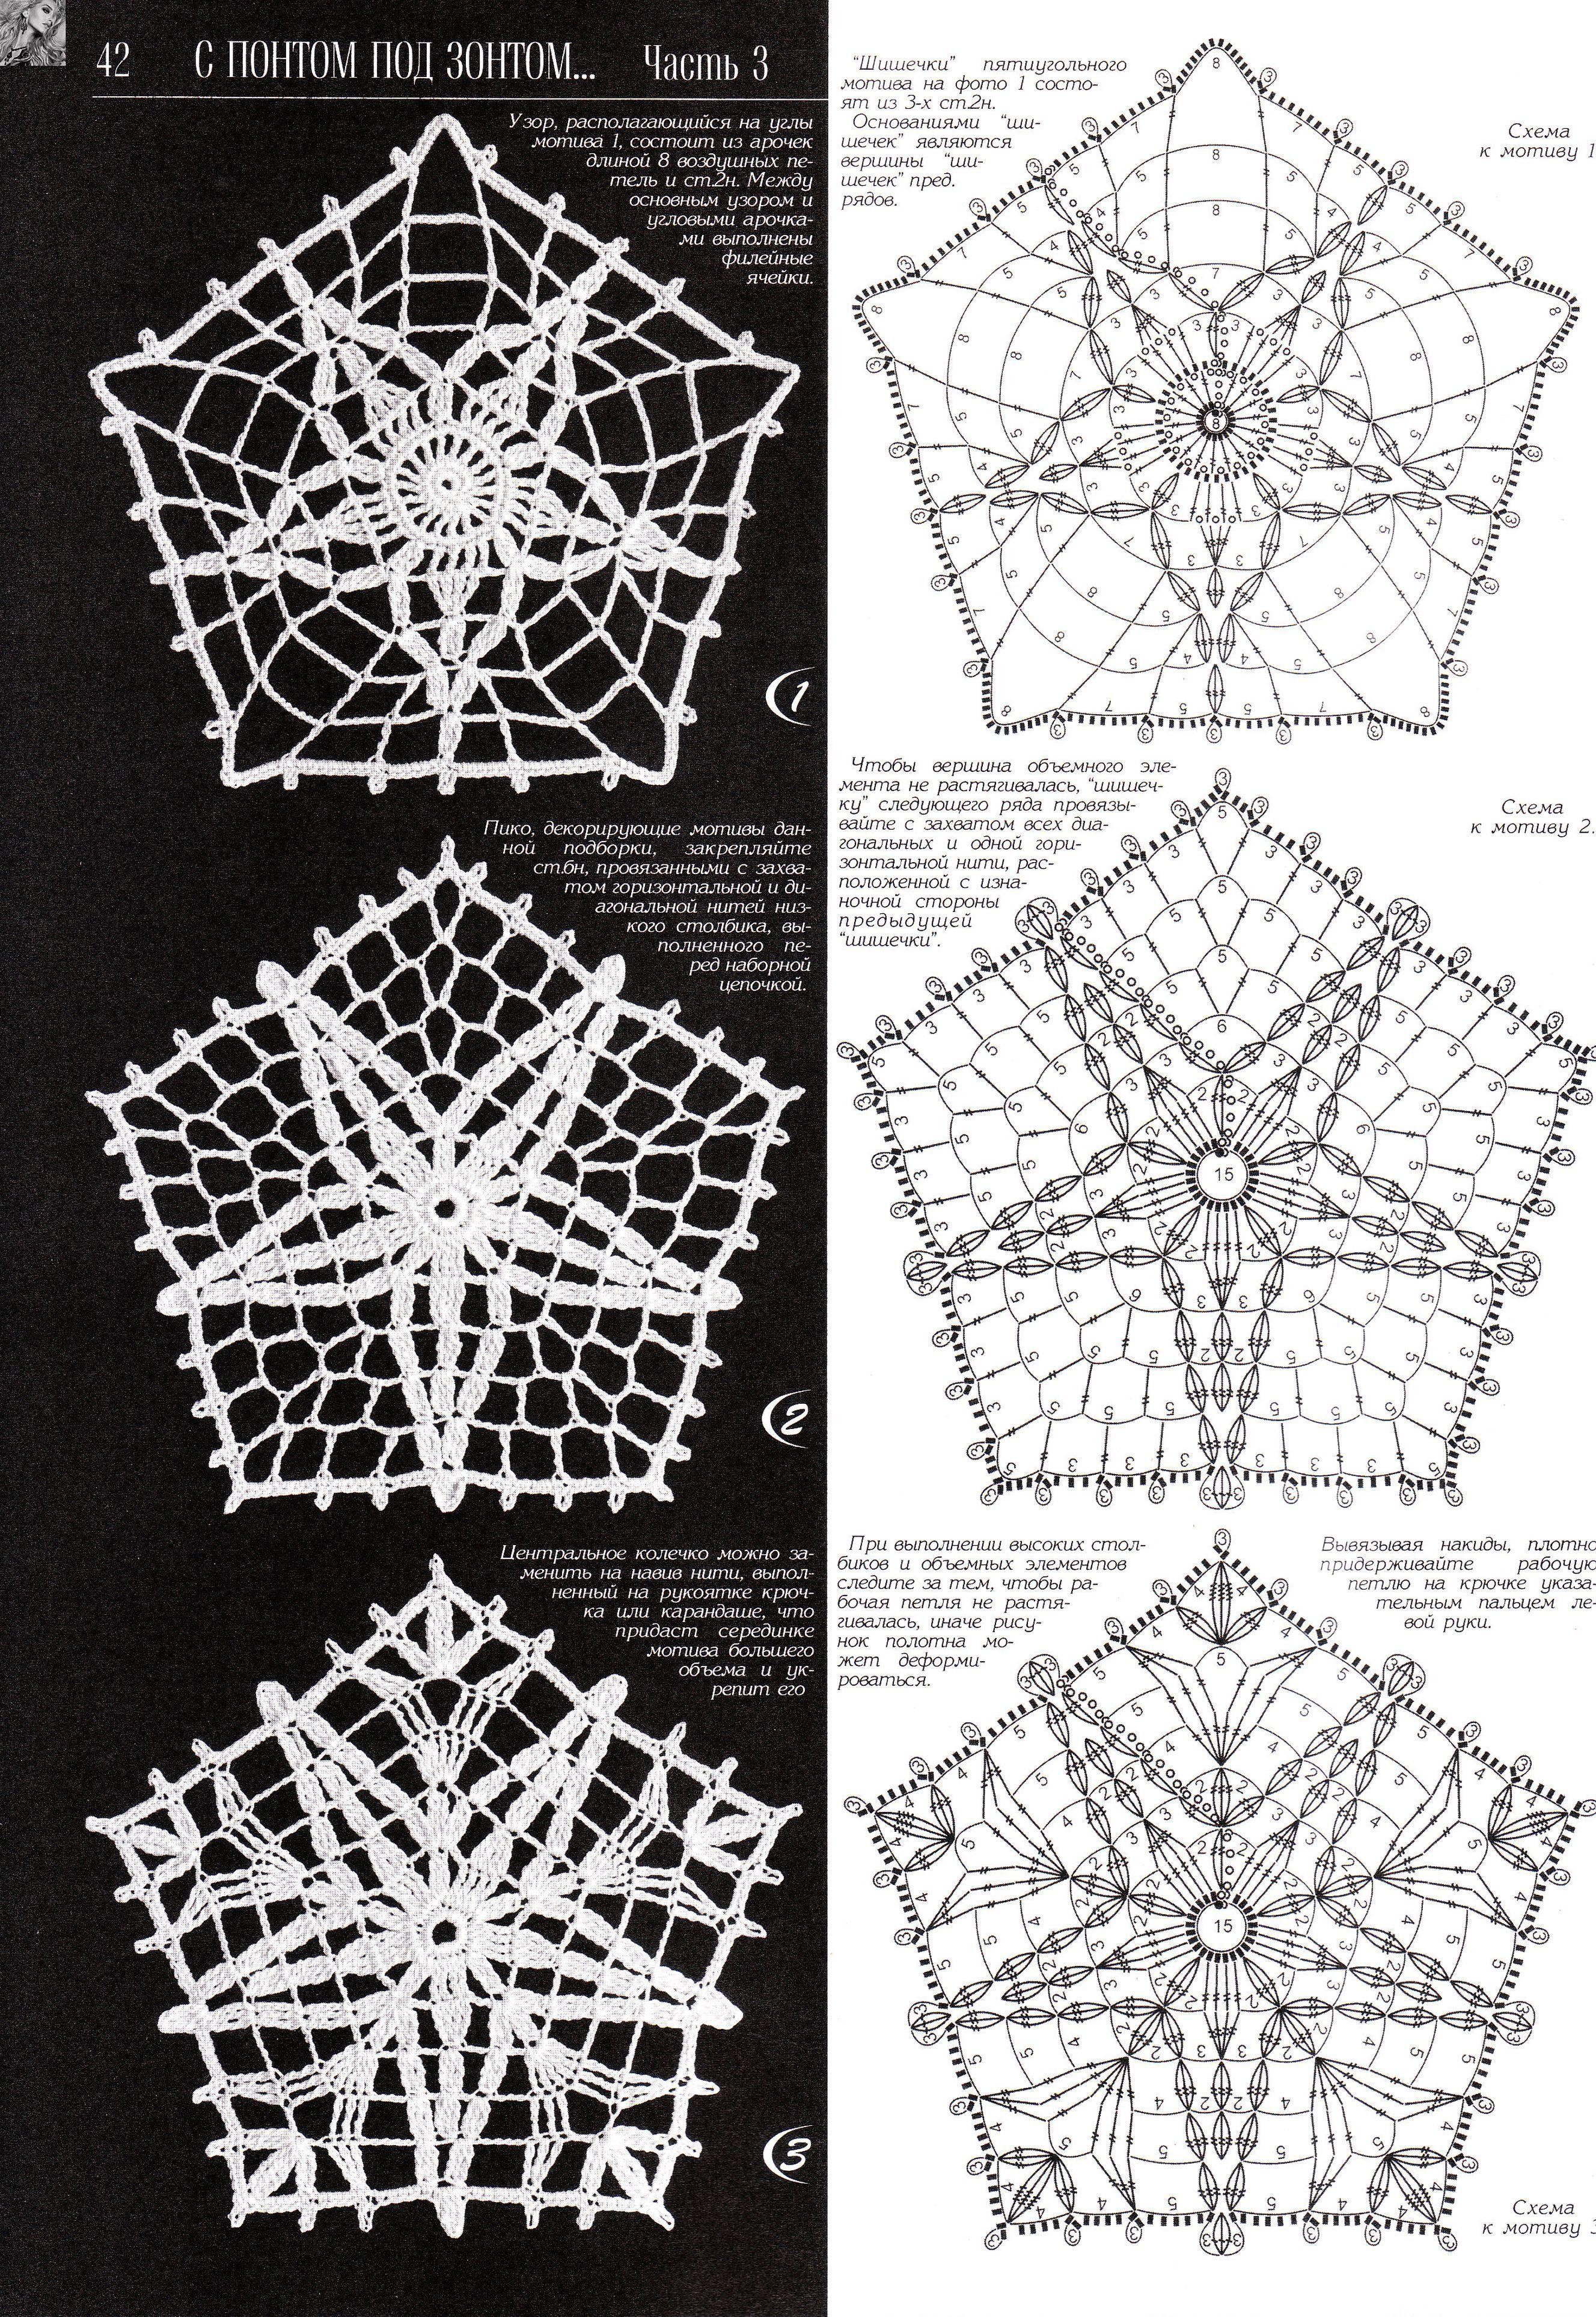 imgbox - fast, simple image host | Crochet Patterns & Tutorials ...